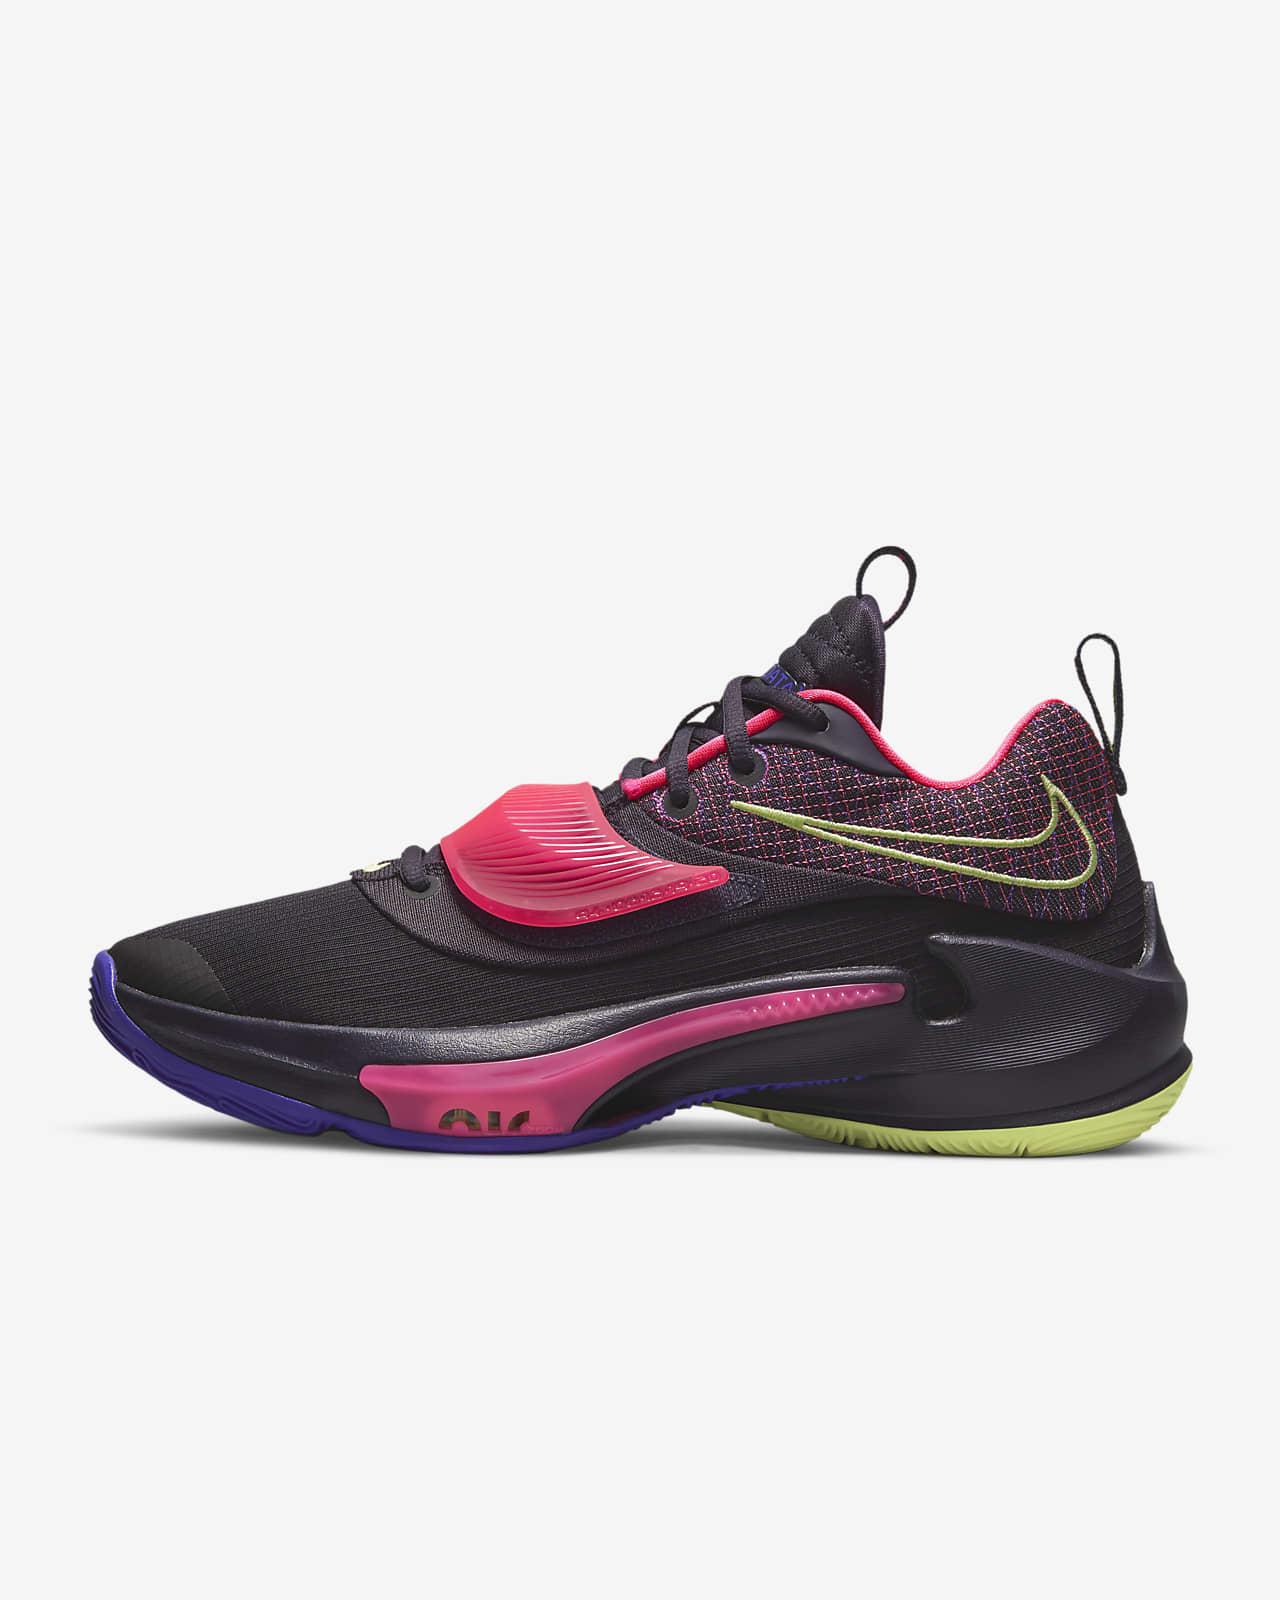 Chaussure de basketball Zoom Freak3